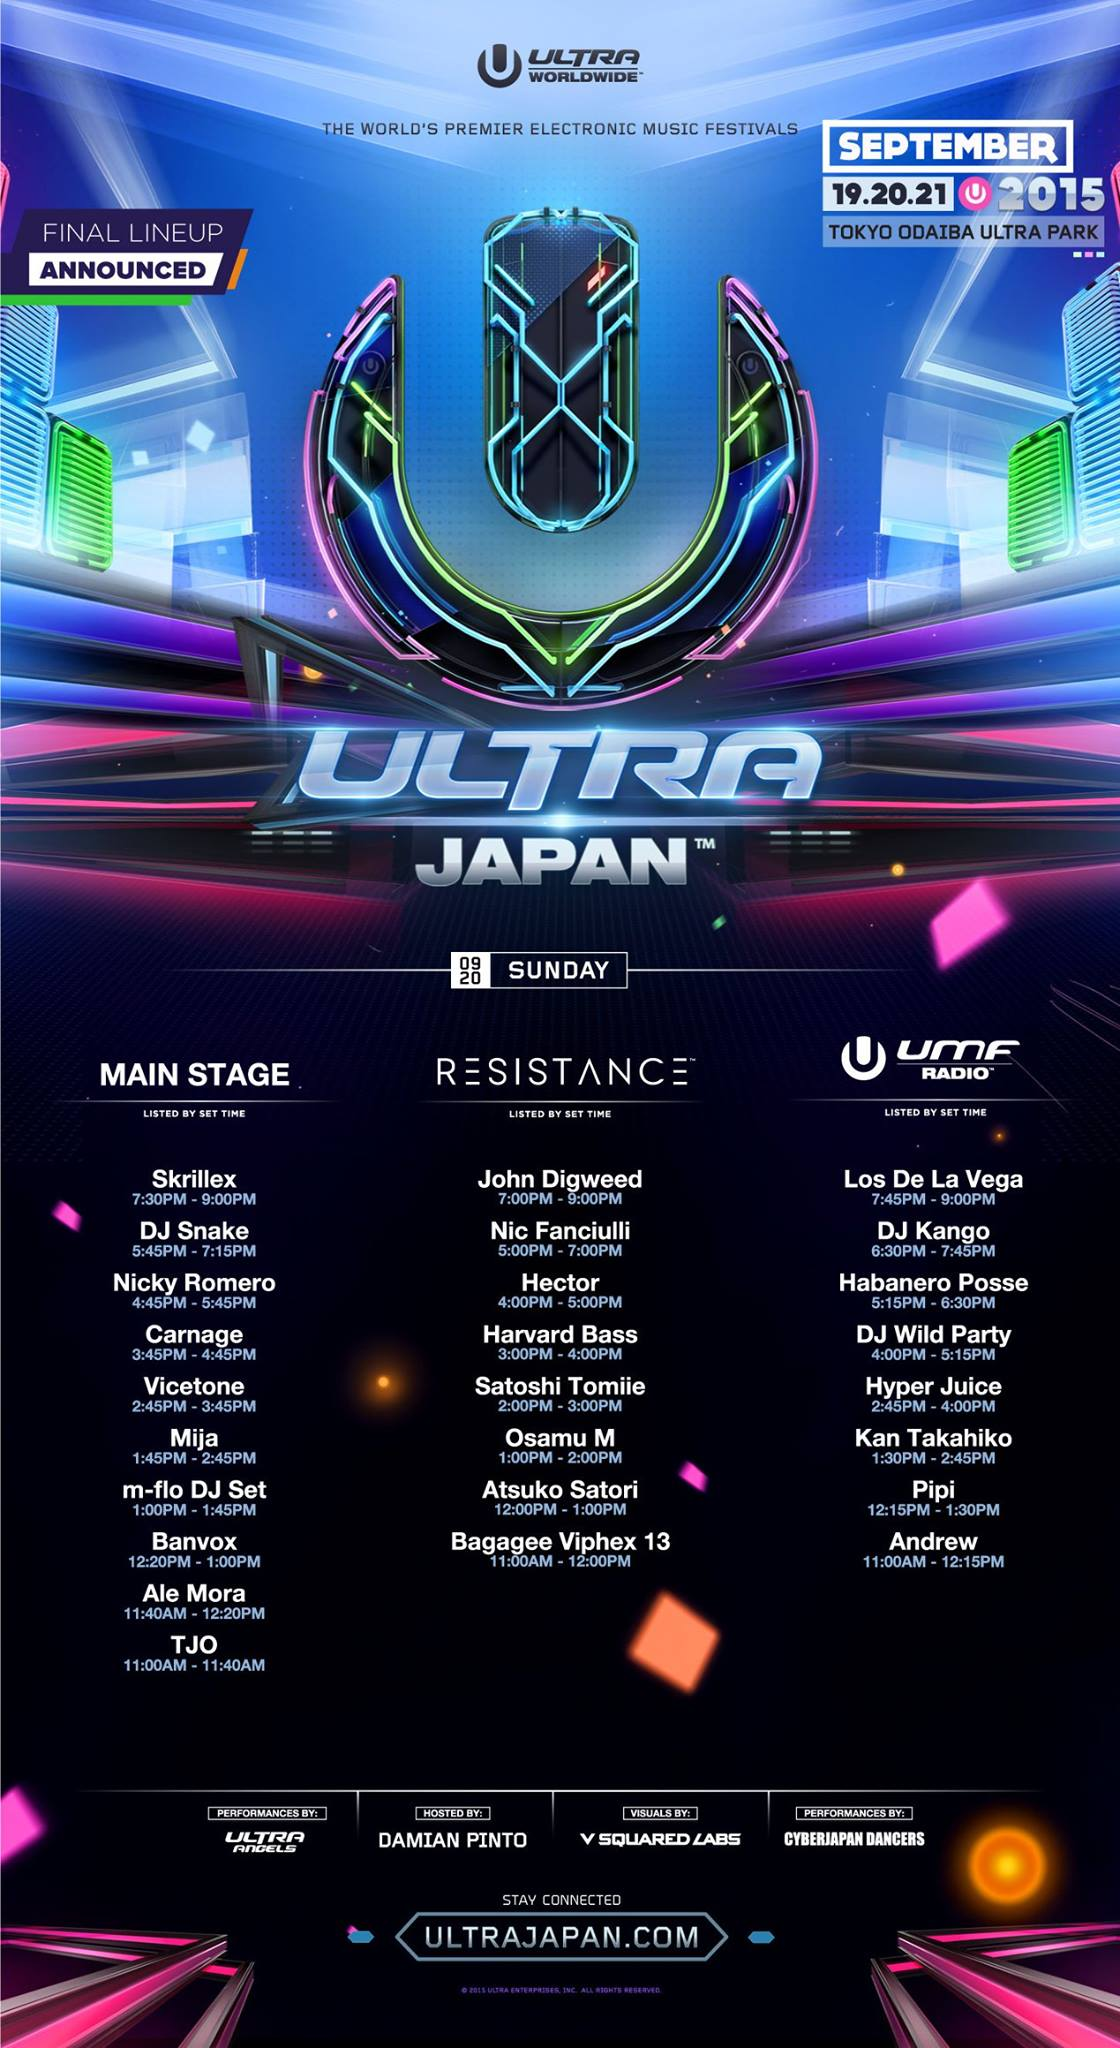 ULTRA JAPAN 2015 DAY 2